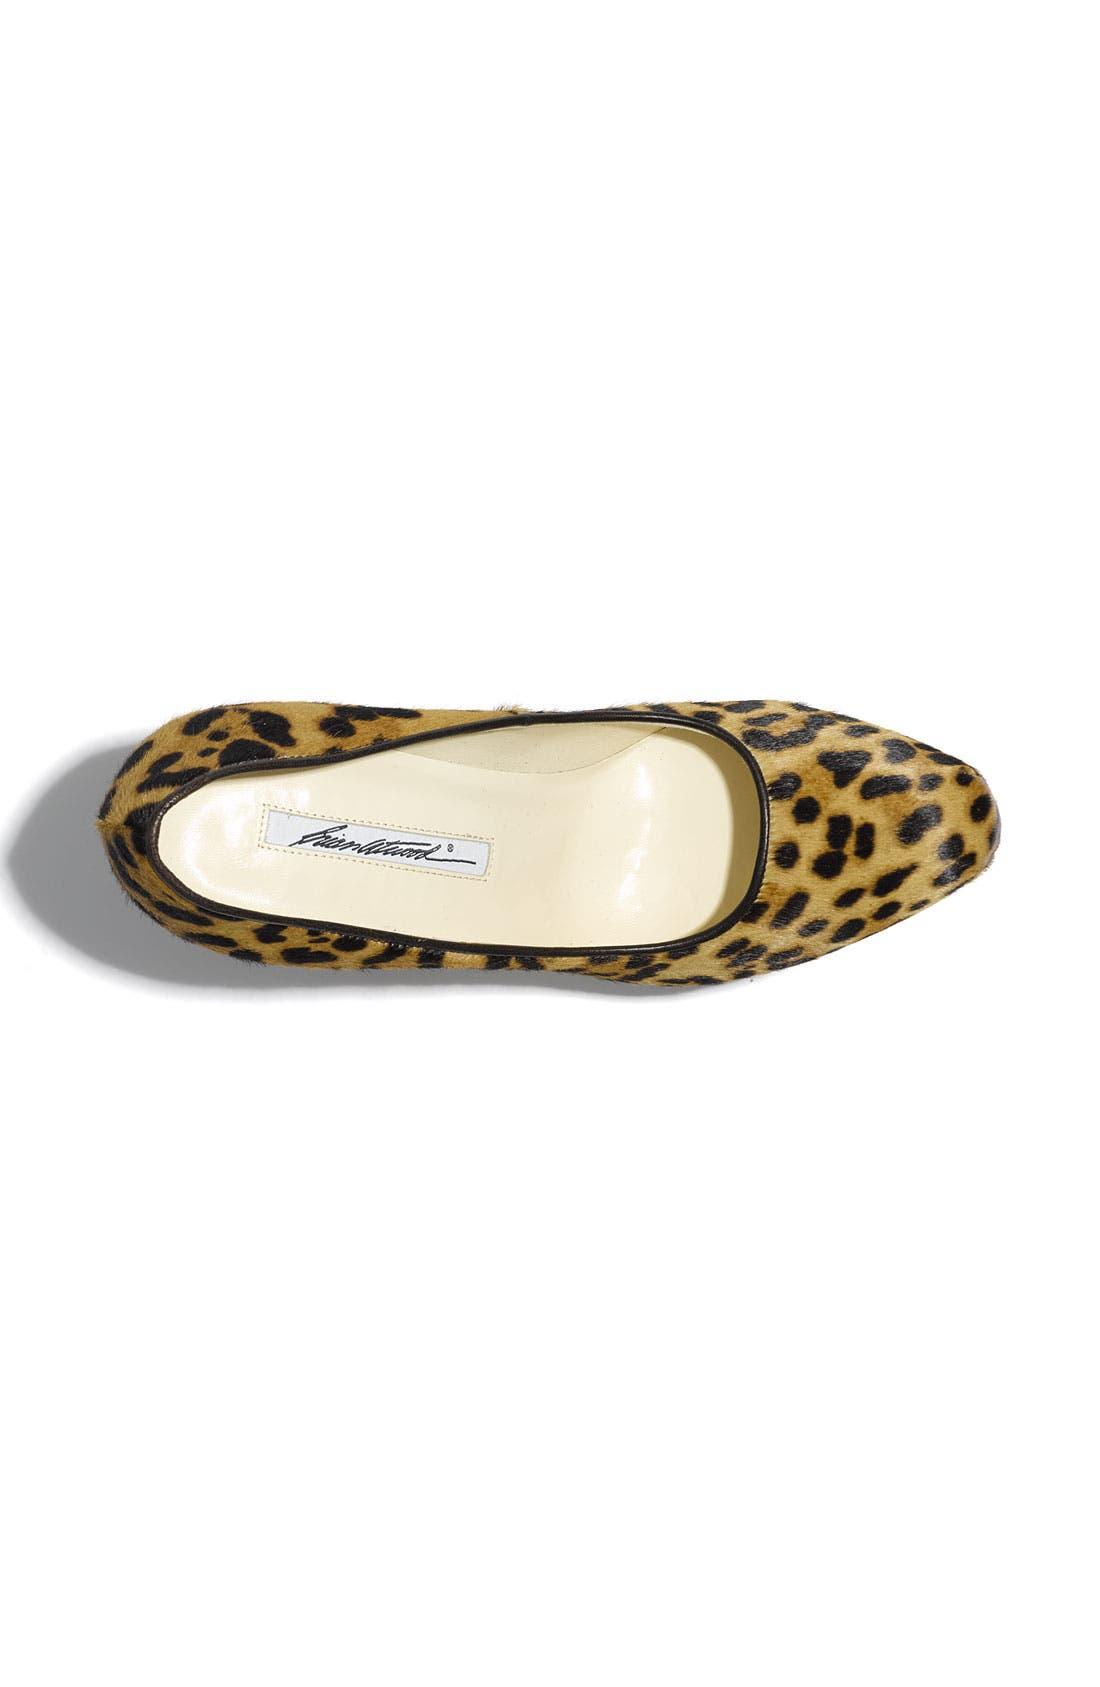 Alternate Image 3  - Brian Atwood Leopard Print Calf Hair Platform Pump